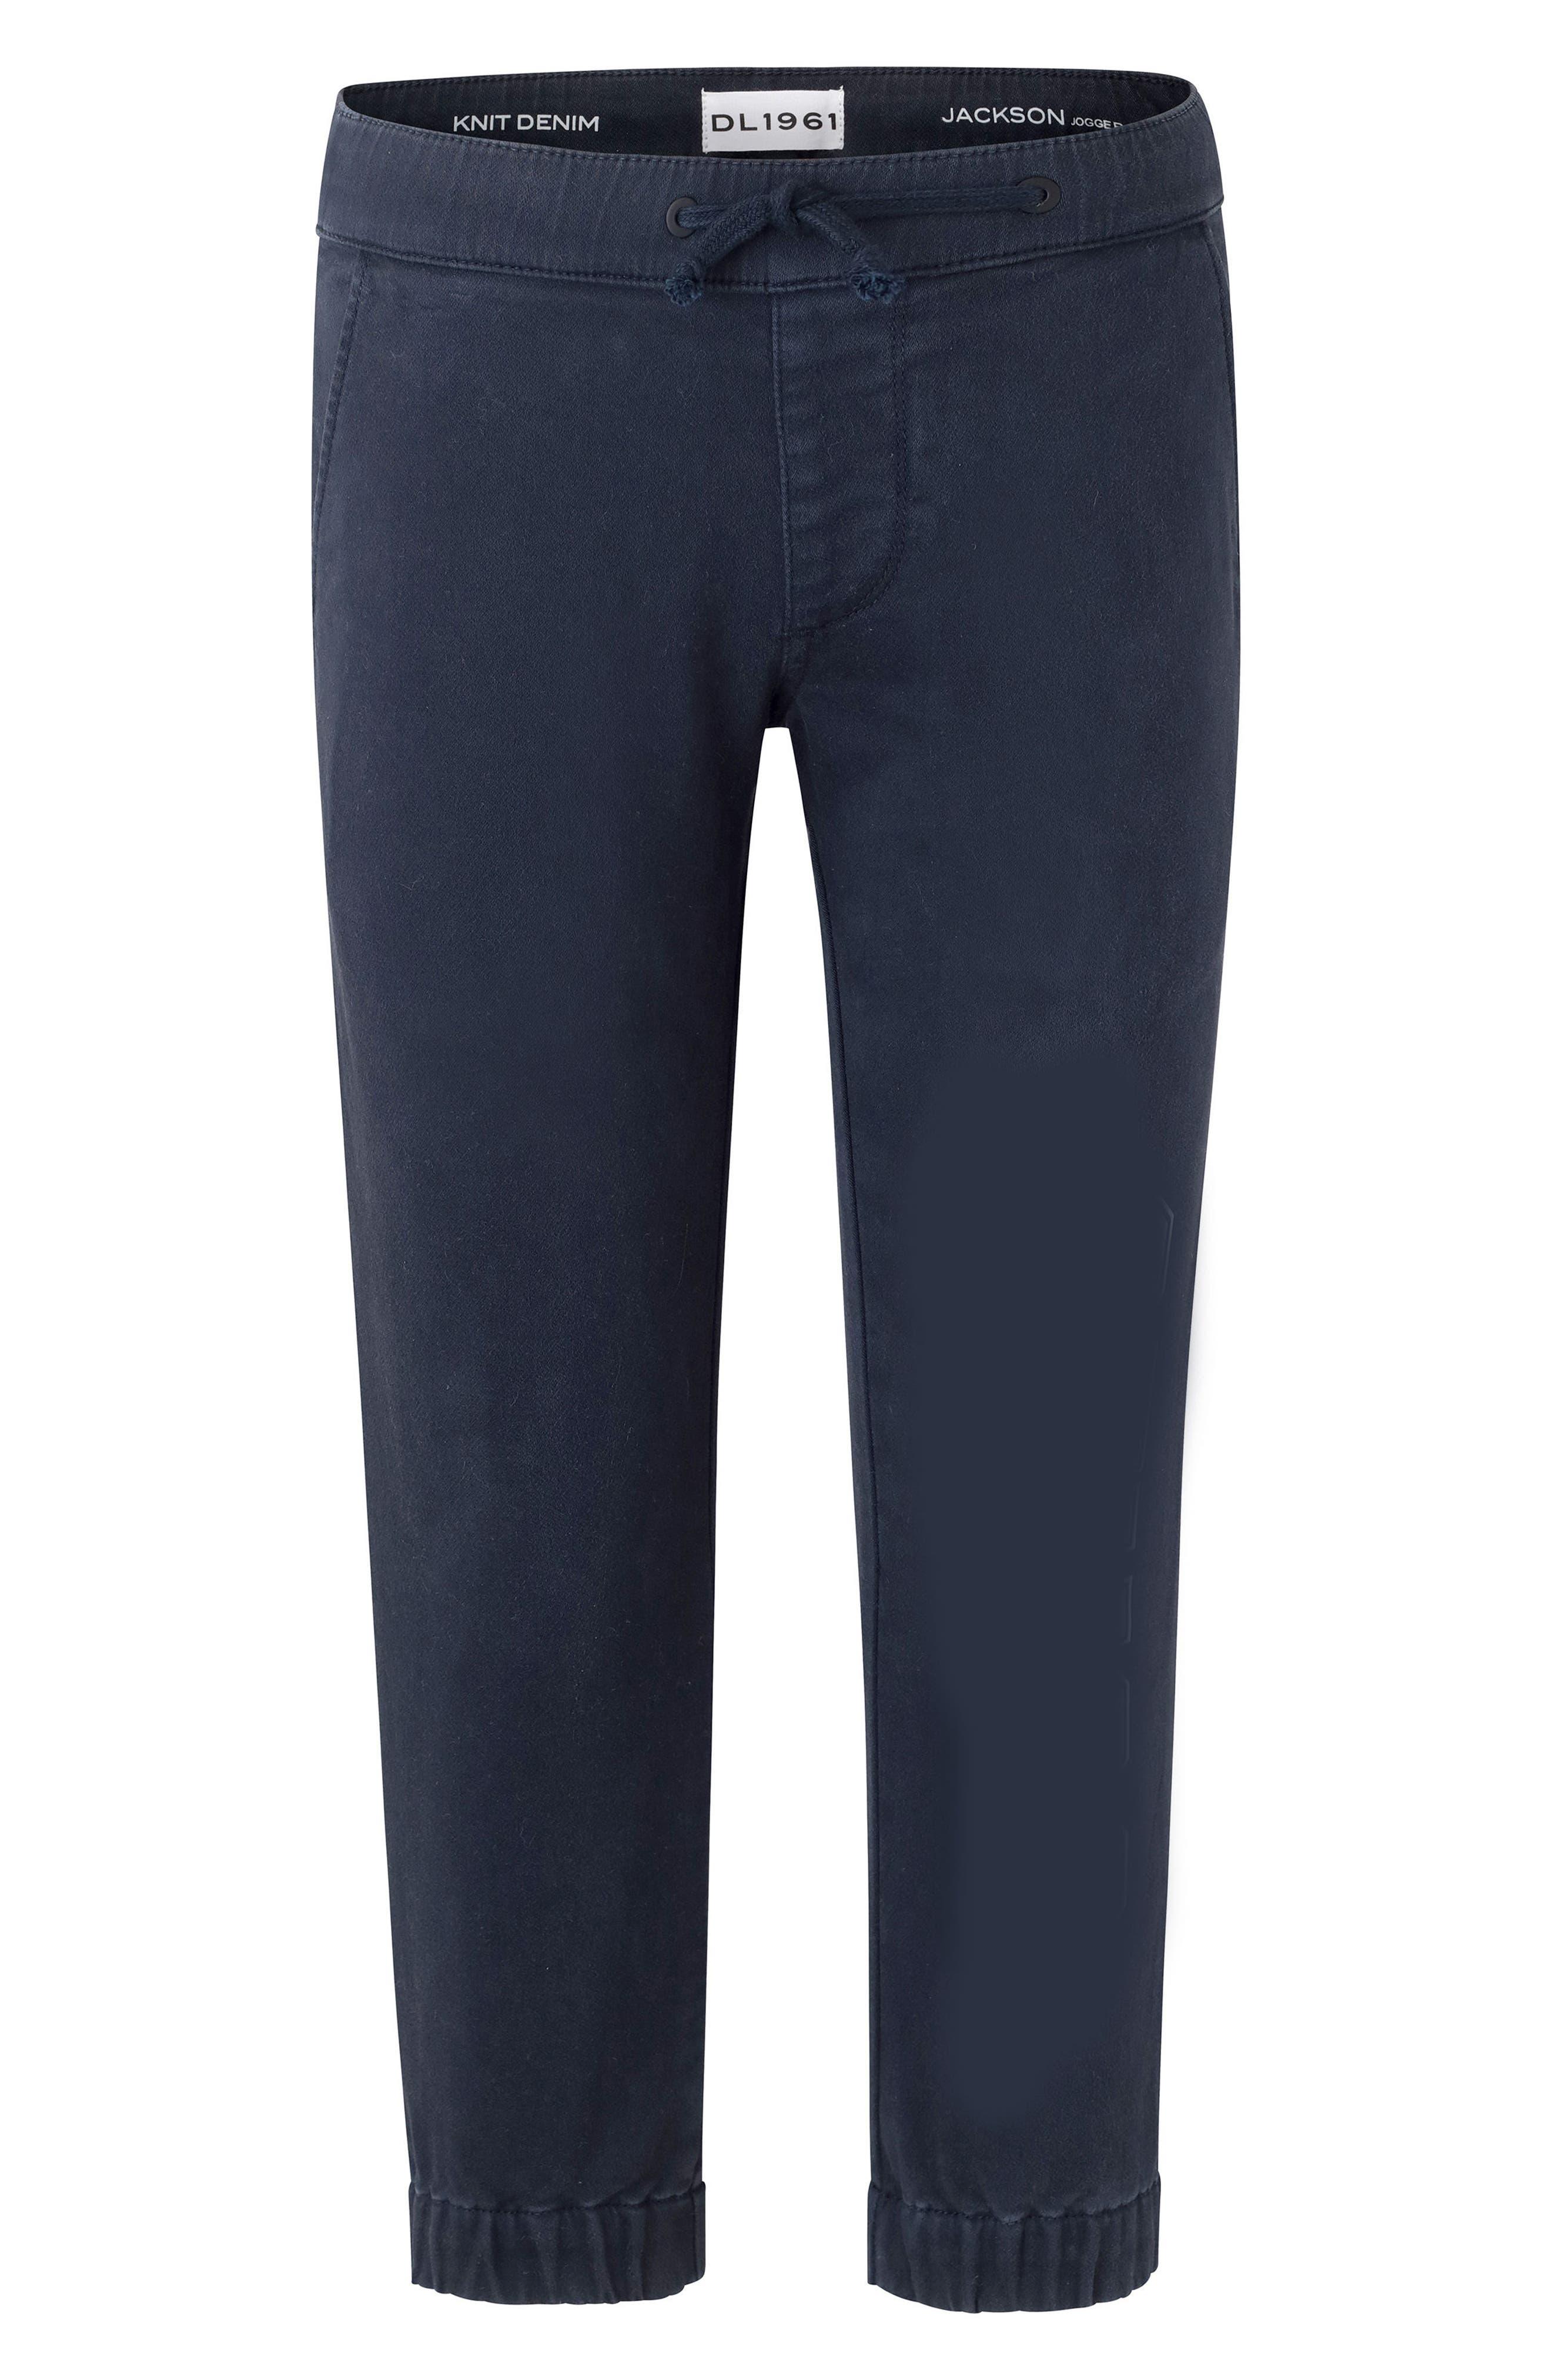 Jackson Stretch Denim Jogger Pants,                         Main,                         color, YASS